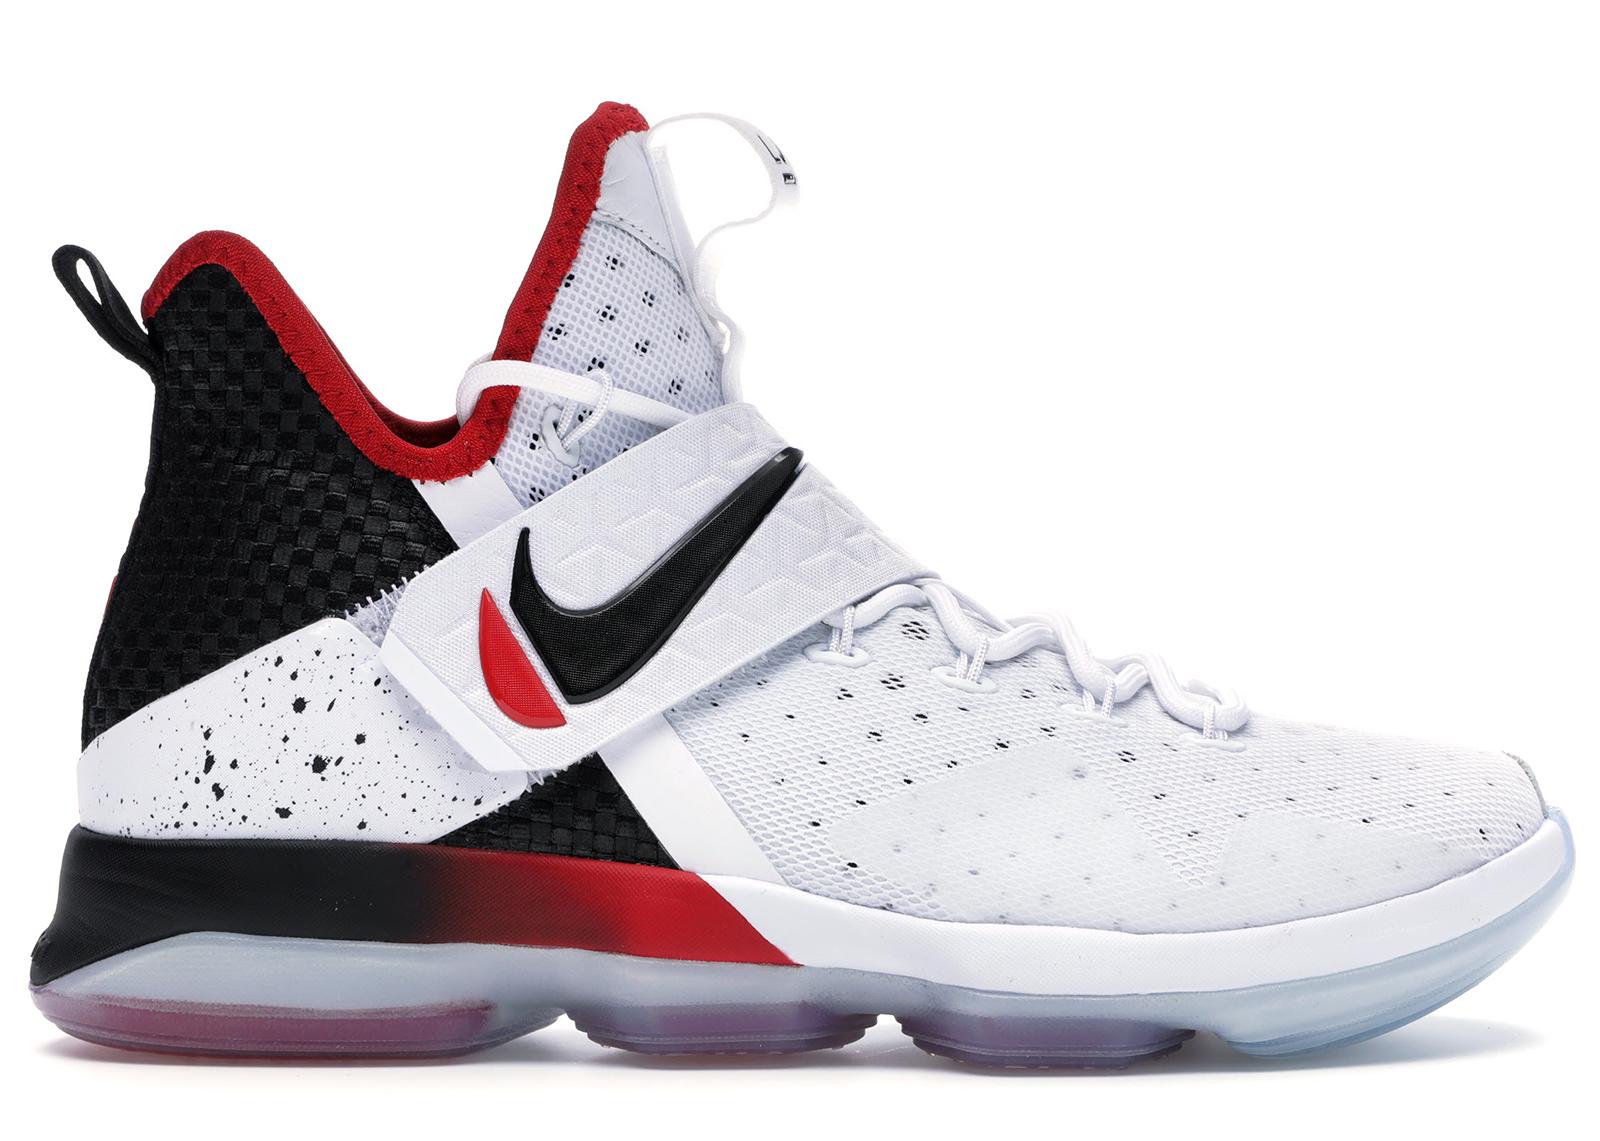 Nike LeBron 14 Flip the Switch - 852405-103